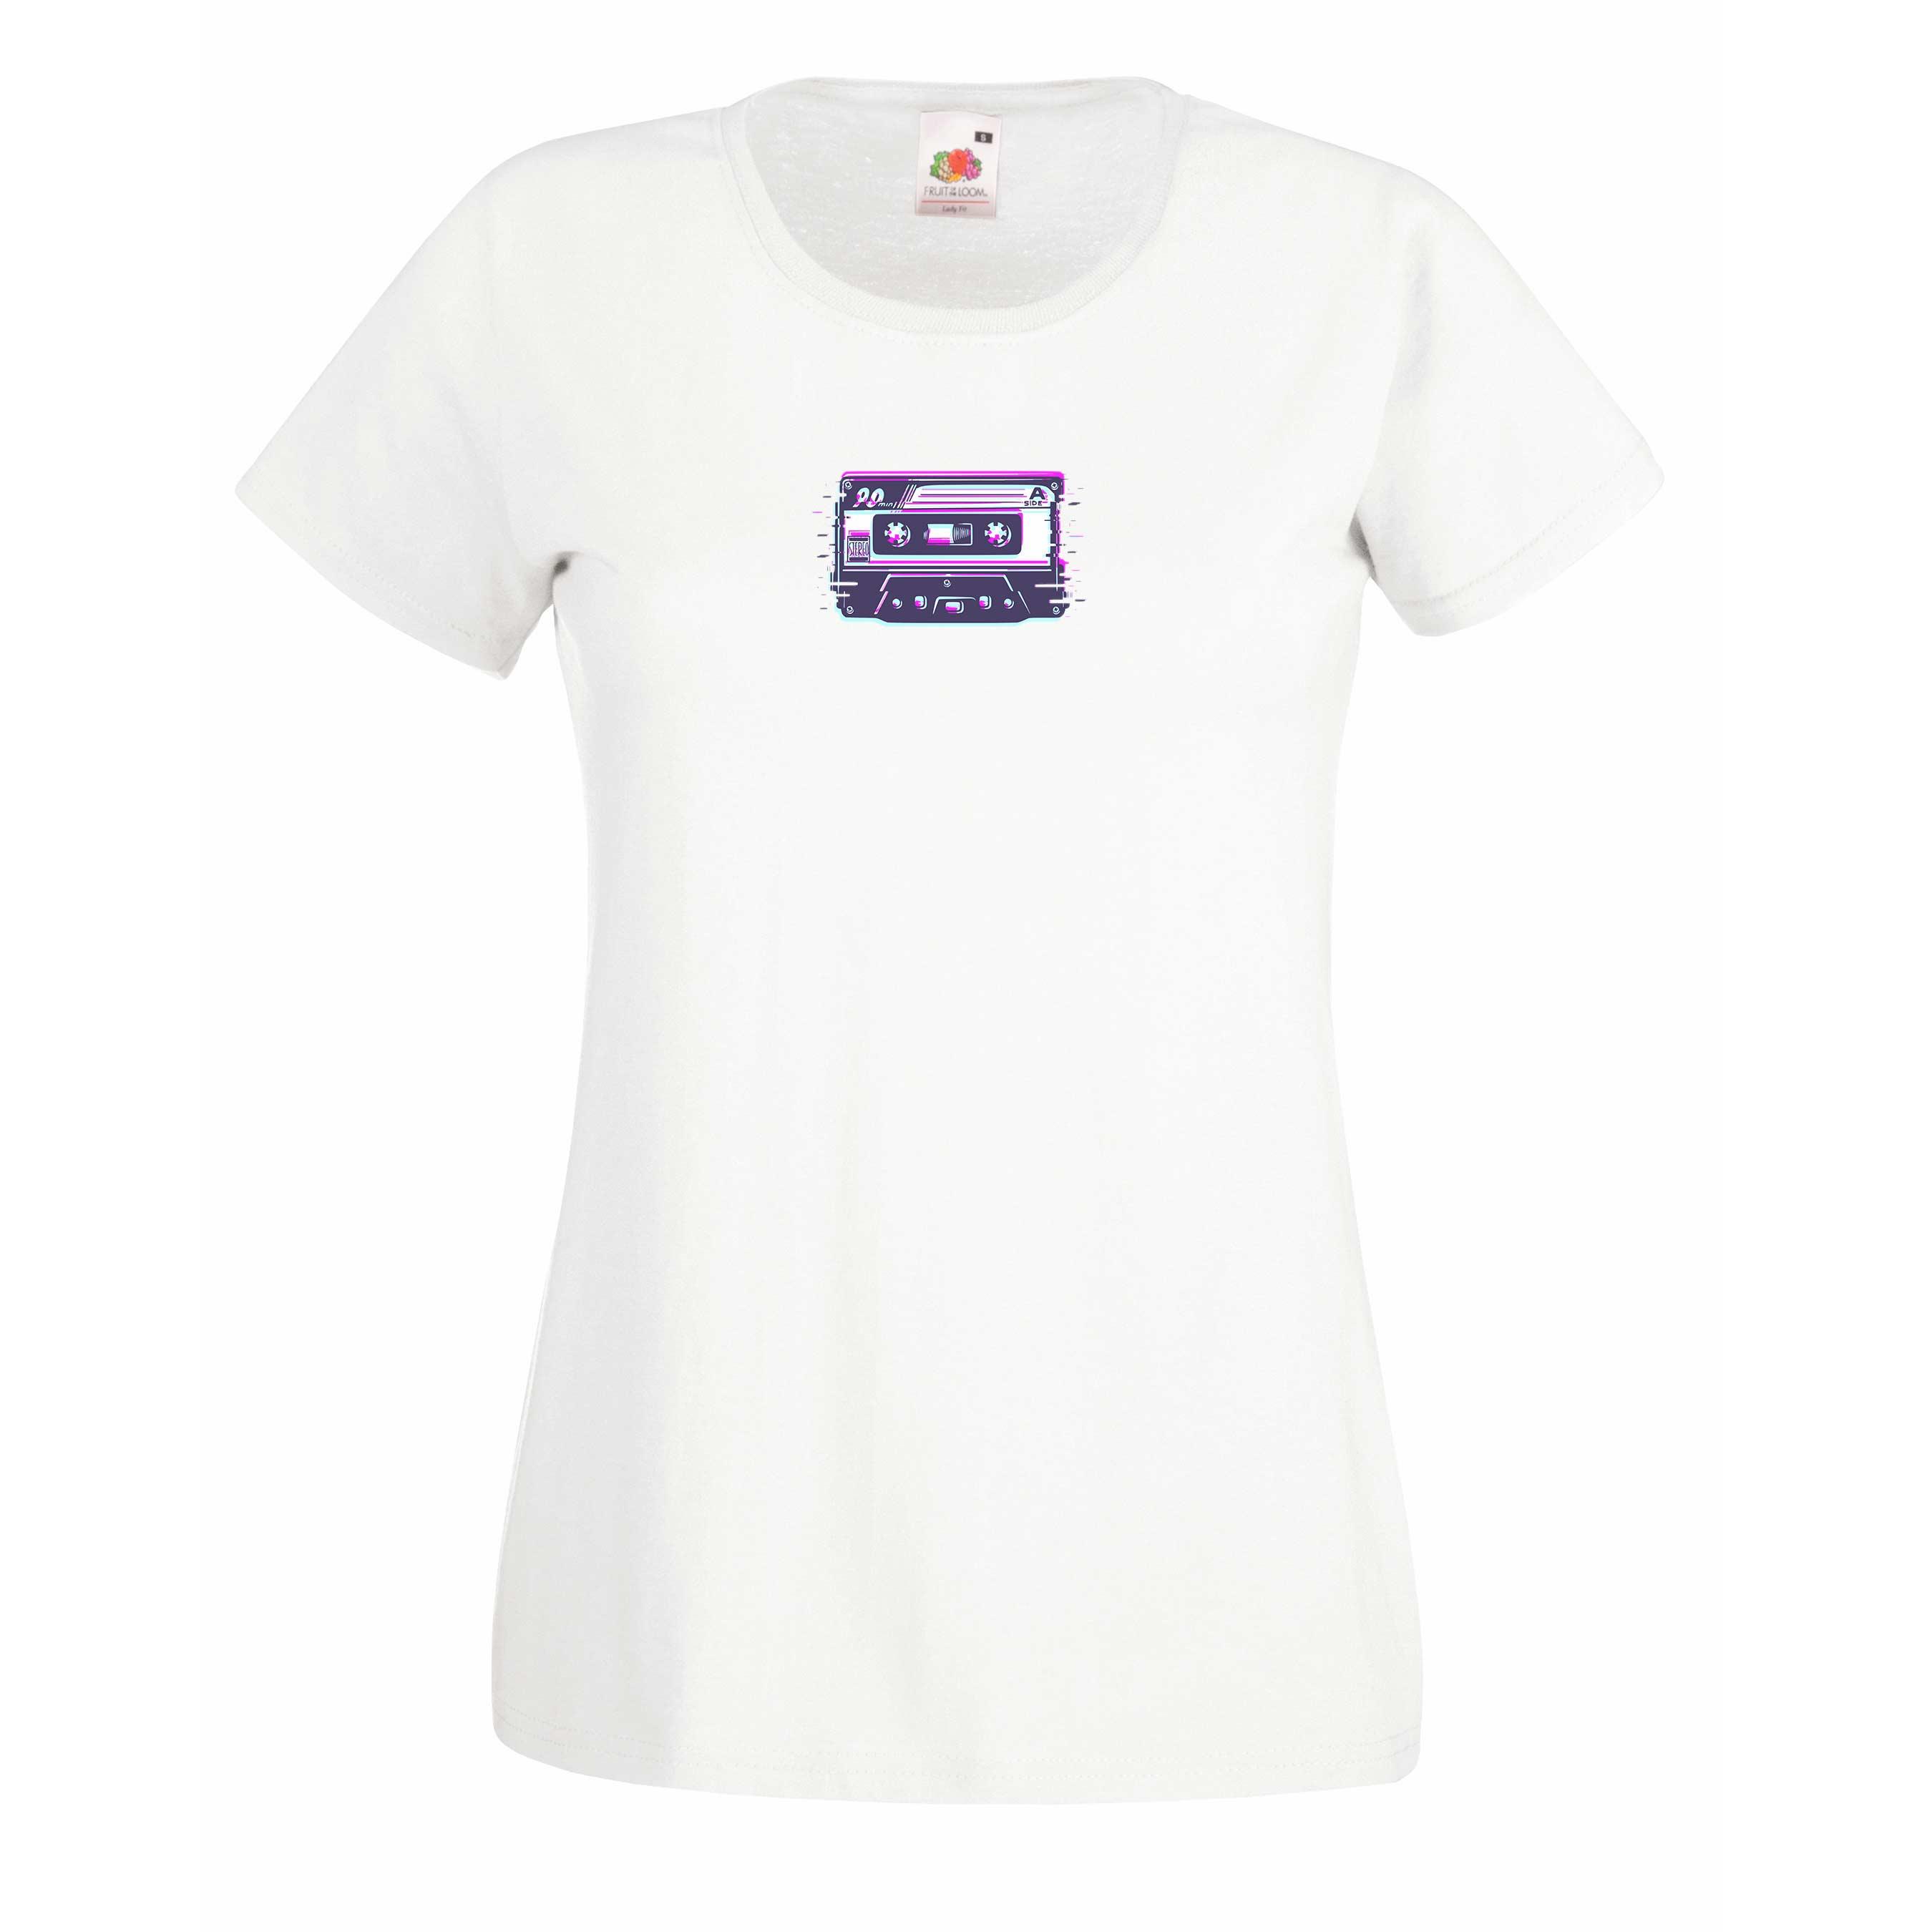 Small cassette design for t-shirt, hoodie & sweatshirt